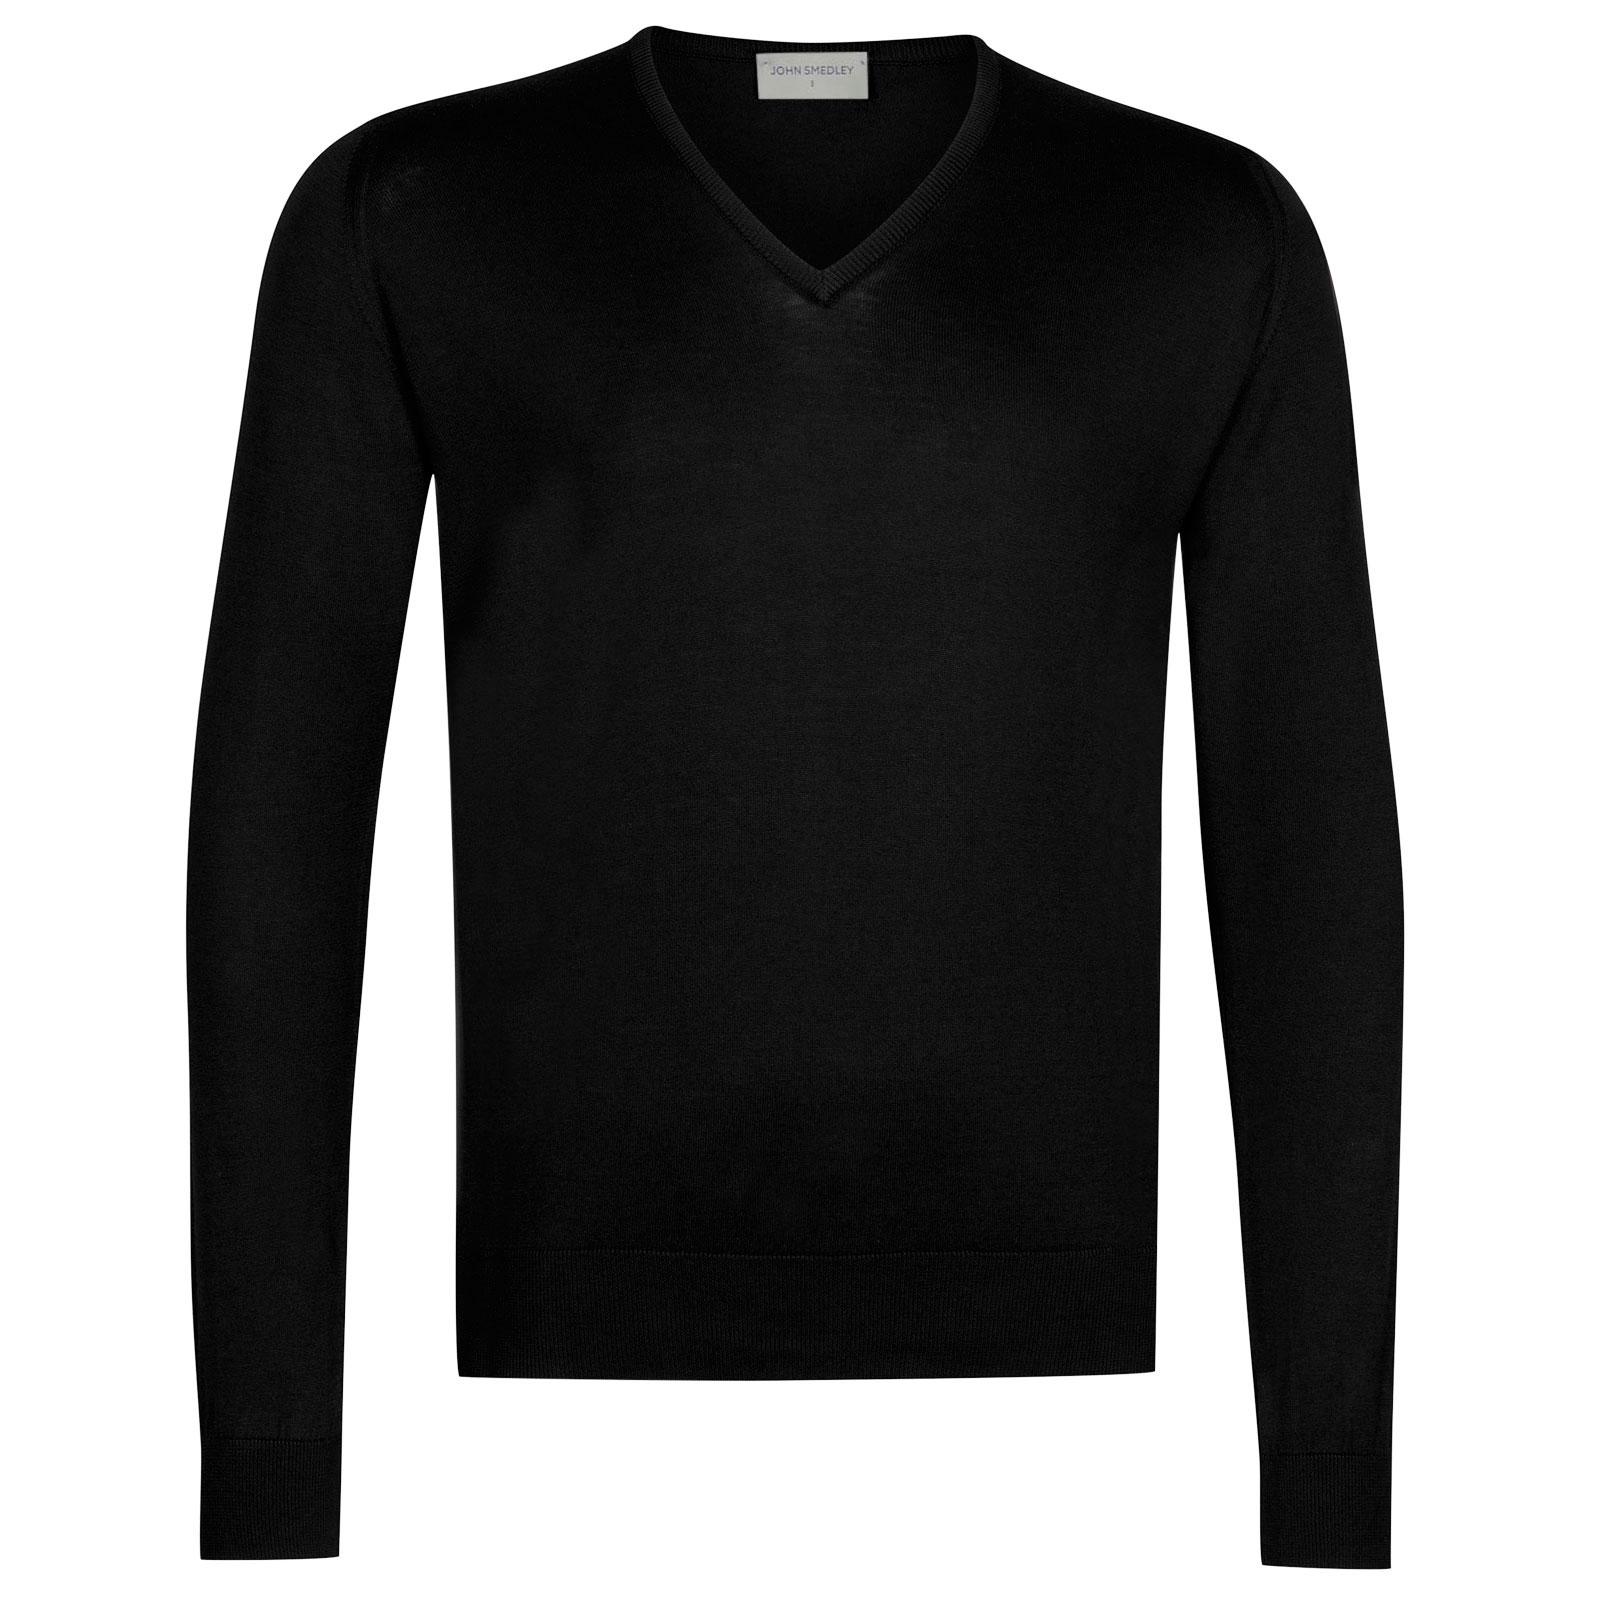 John Smedley Woburn Sea Island Cotton Pullover in Black-L